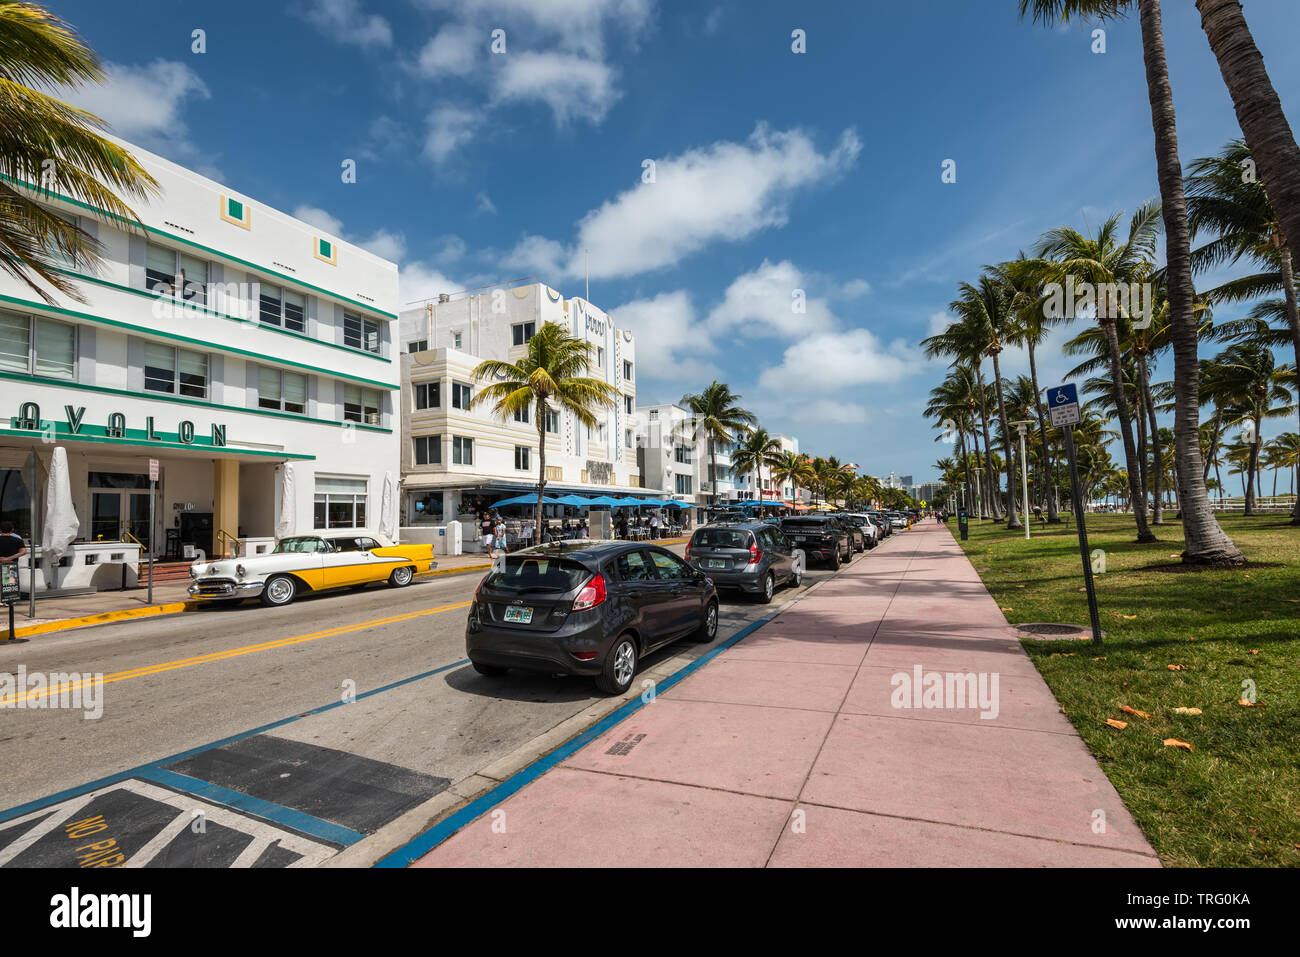 Miami Fl Usa April 19 2019 Street Life At The